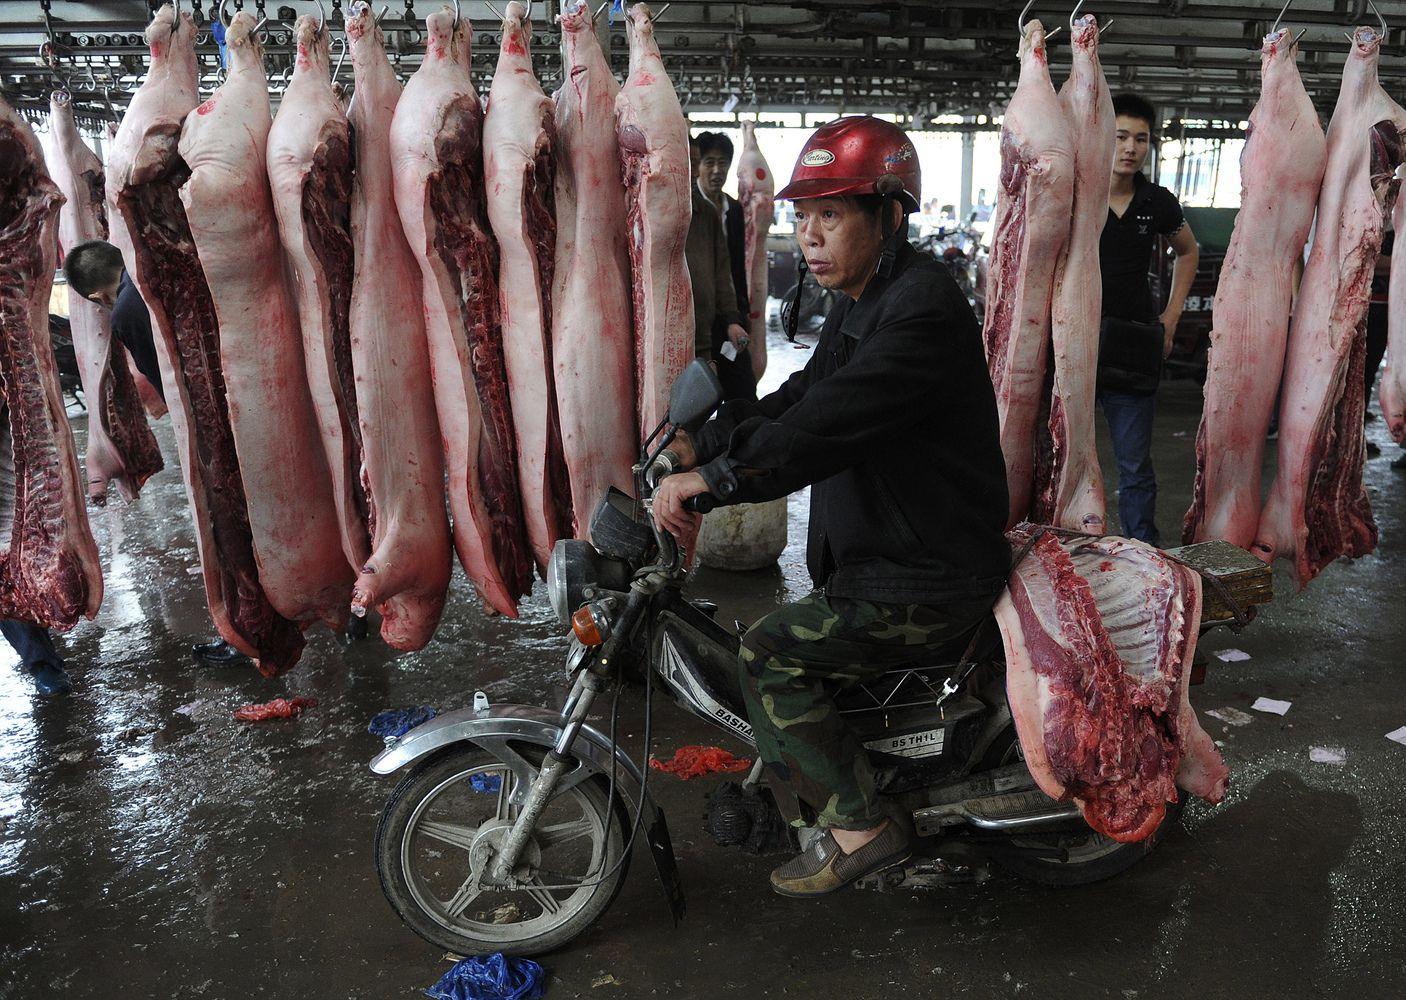 Kiaulininkams Kinijoje darosi nebesaldu